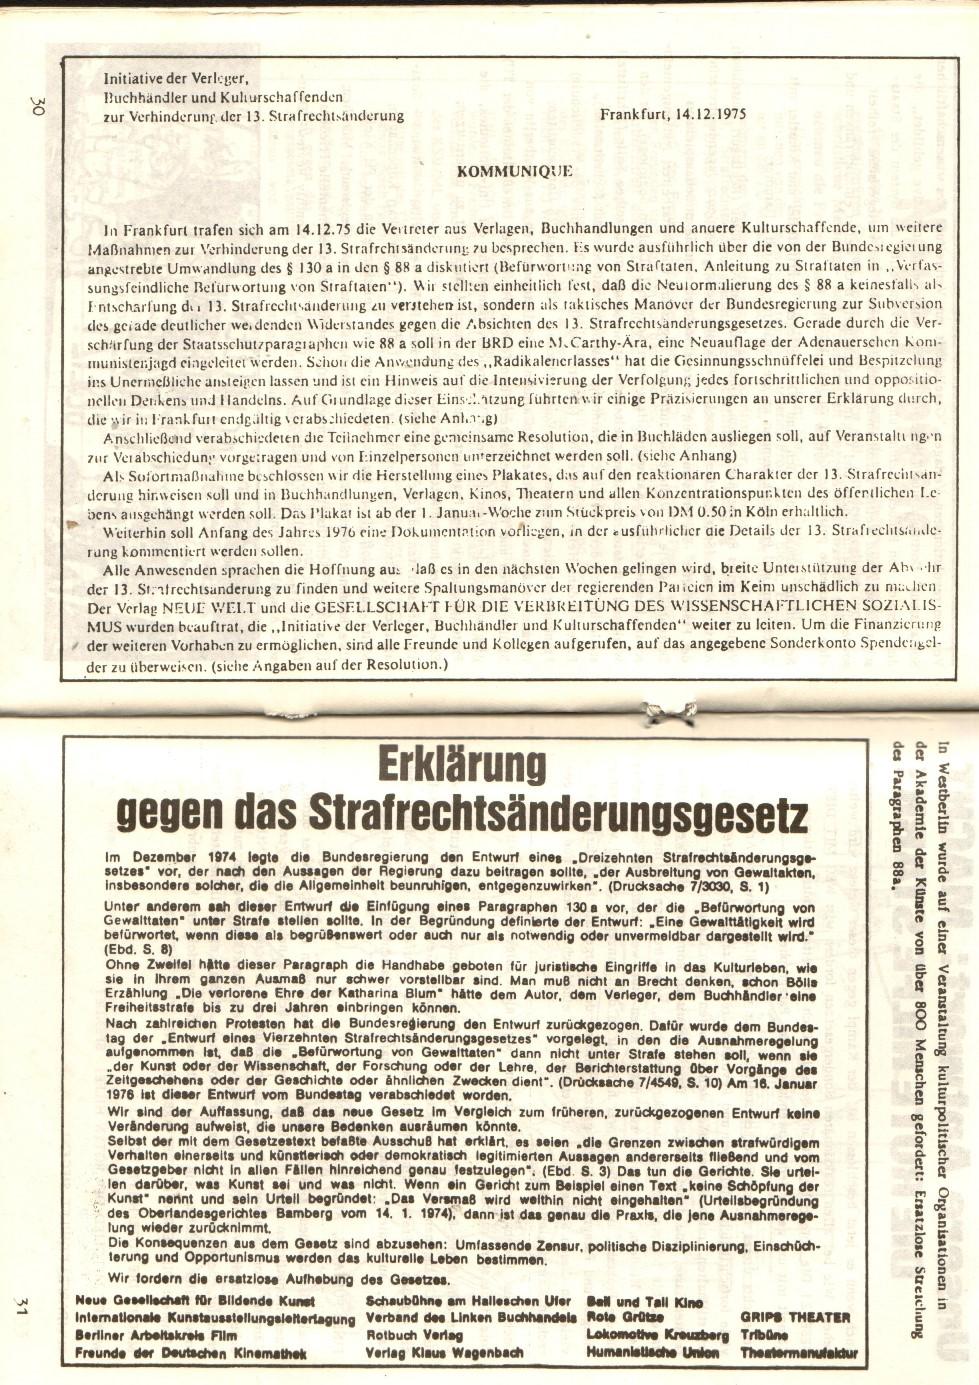 RHD_1976_Doku_Strafrechtsaenderungsgesetz_16